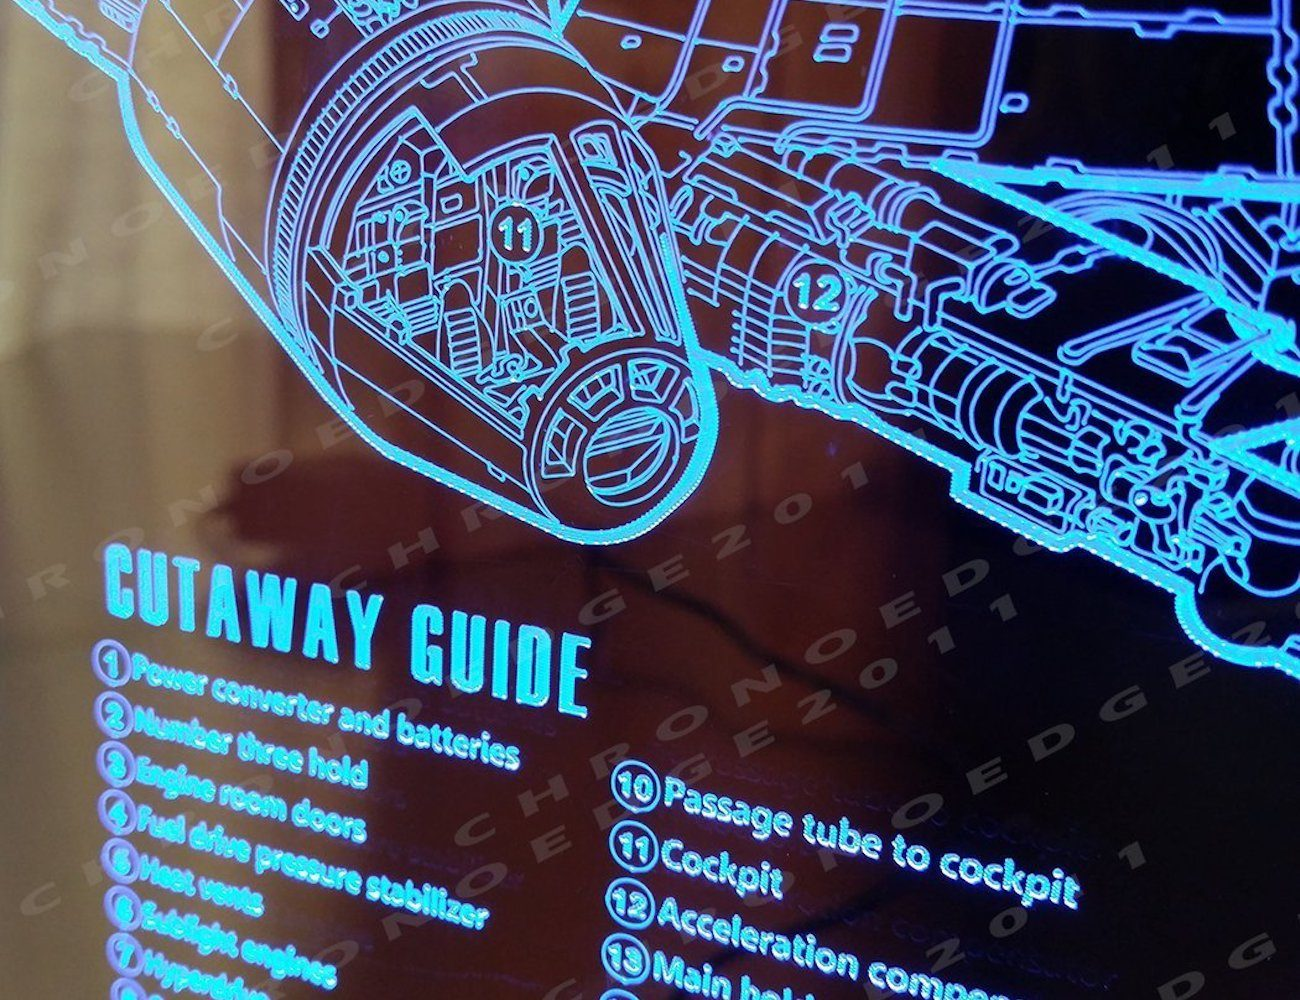 Star Wars Millennium Falcon Guide Lamp